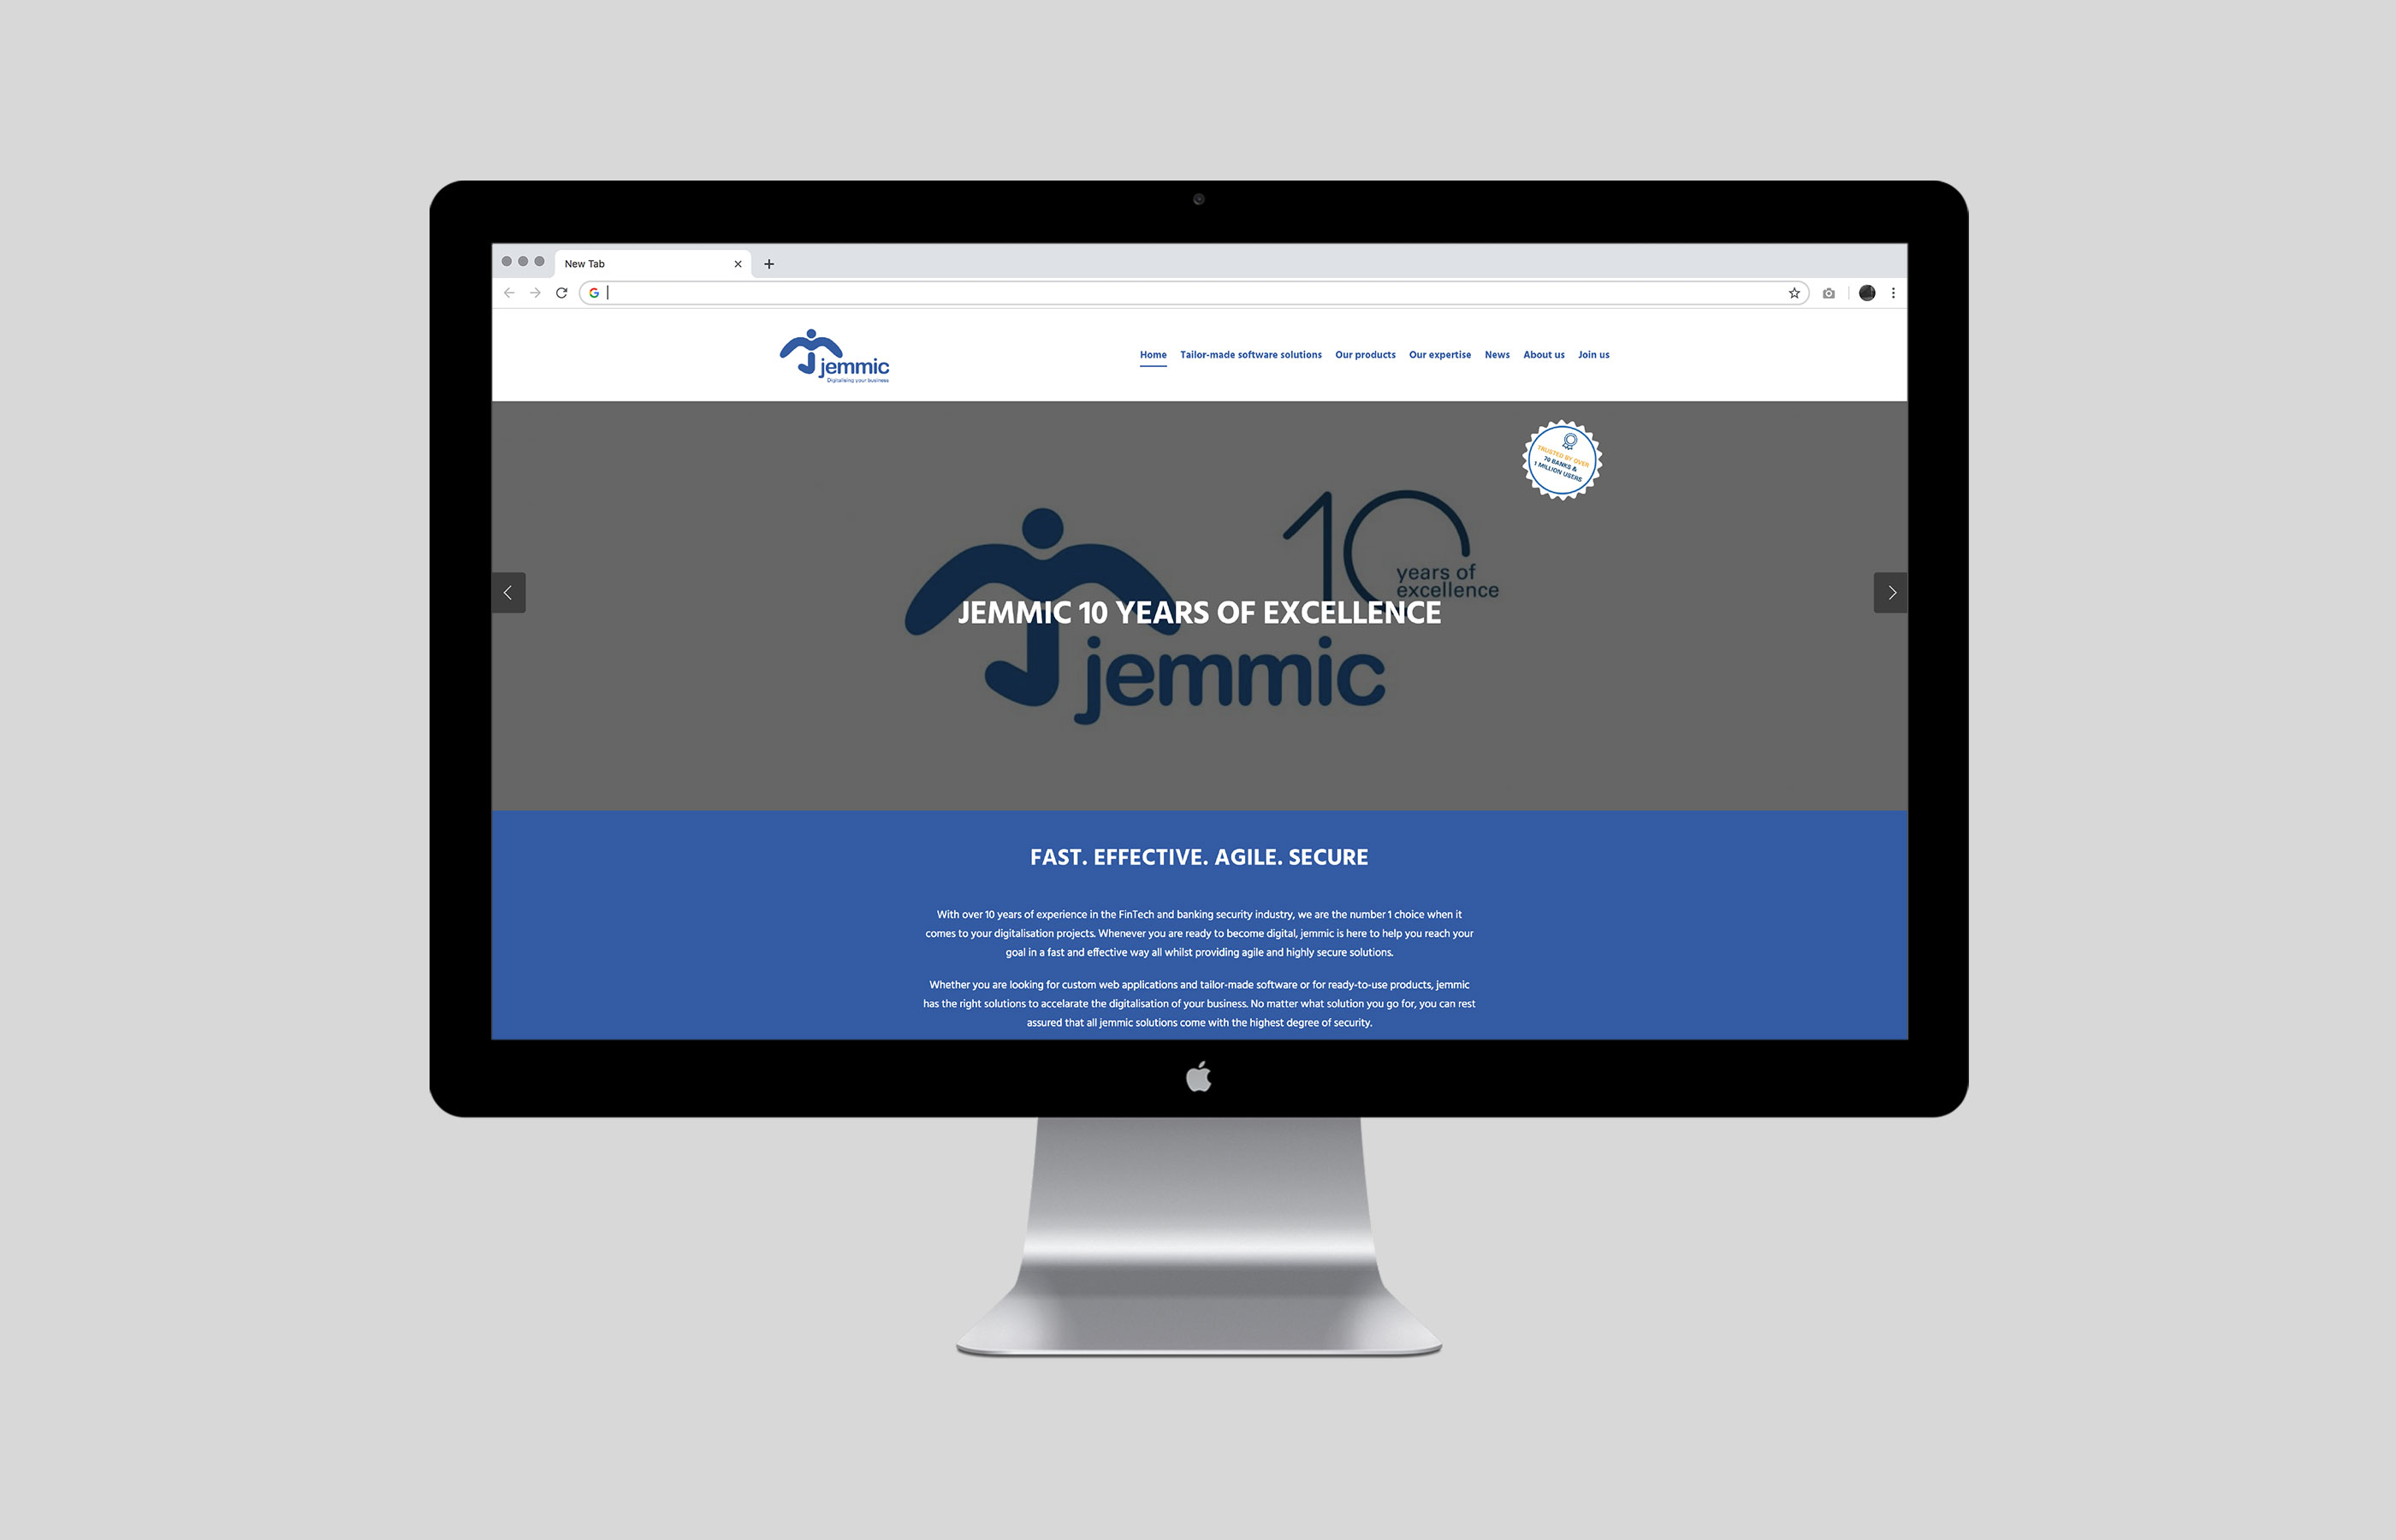 078-0217002-Moskito-Web-JemmicMockup-OneScreen-2800x1800px